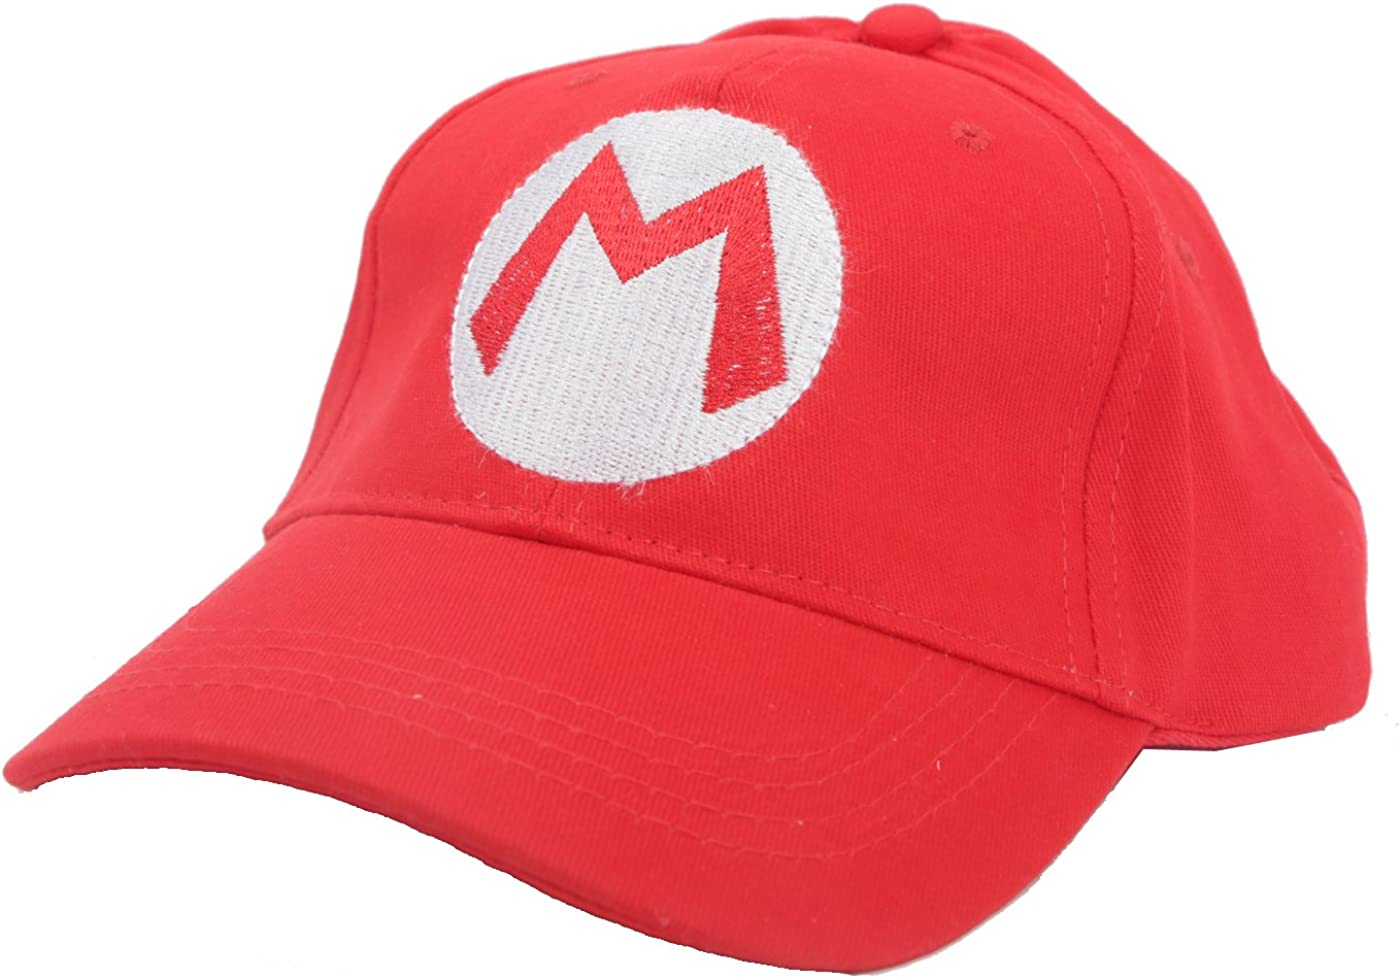 2PCS Super Mario Bros Luigi ADULT Hat Cap Costume cosplay Halloween hat baseball cap